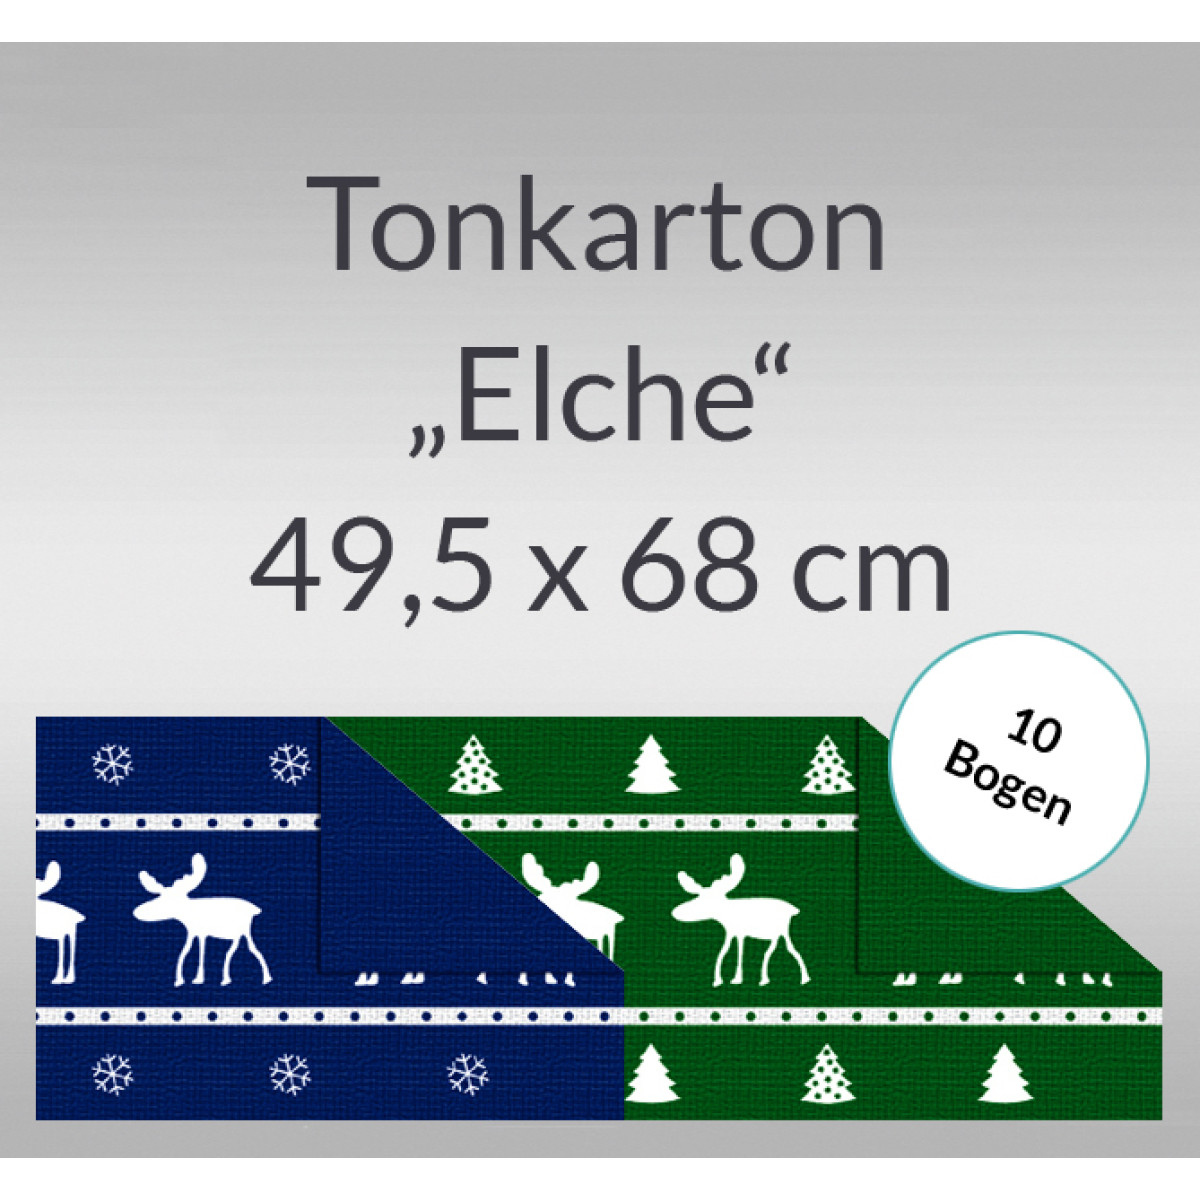 "Tonkarton ""Elche"" 220 g/qm 49,5 x 68 cm - 10 Bogen"